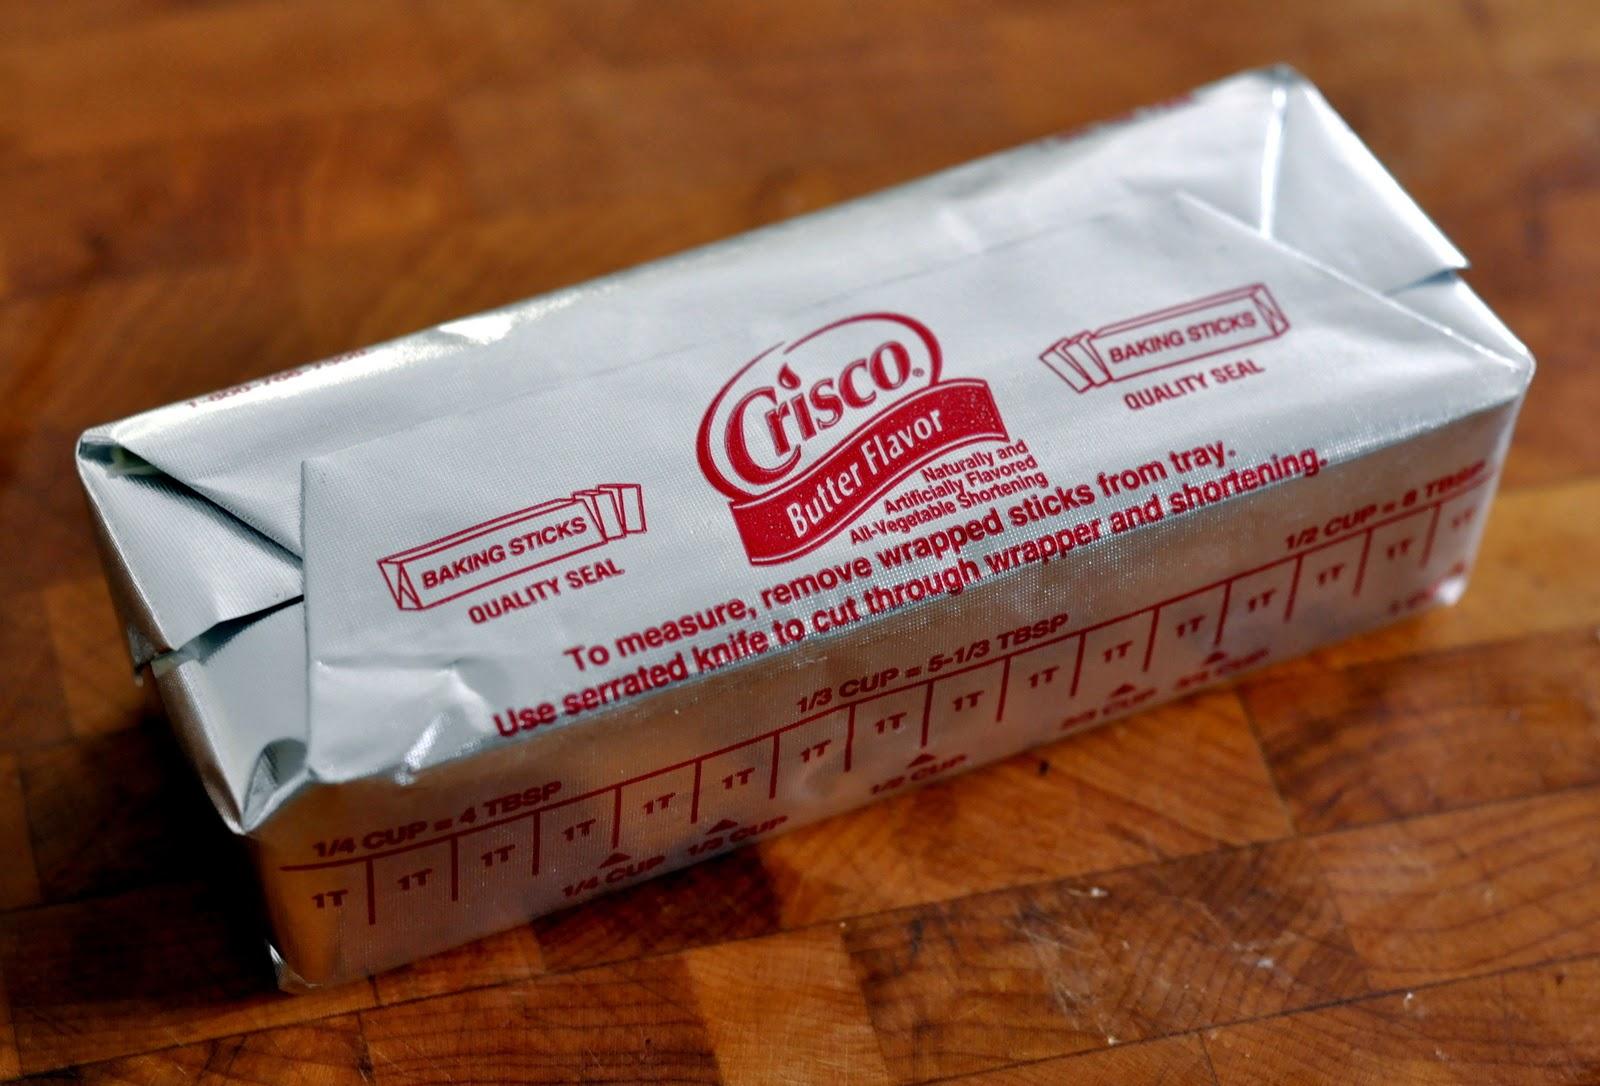 Butter-Flavored-Crisco-Baking-Stick-tasteasyougo.com